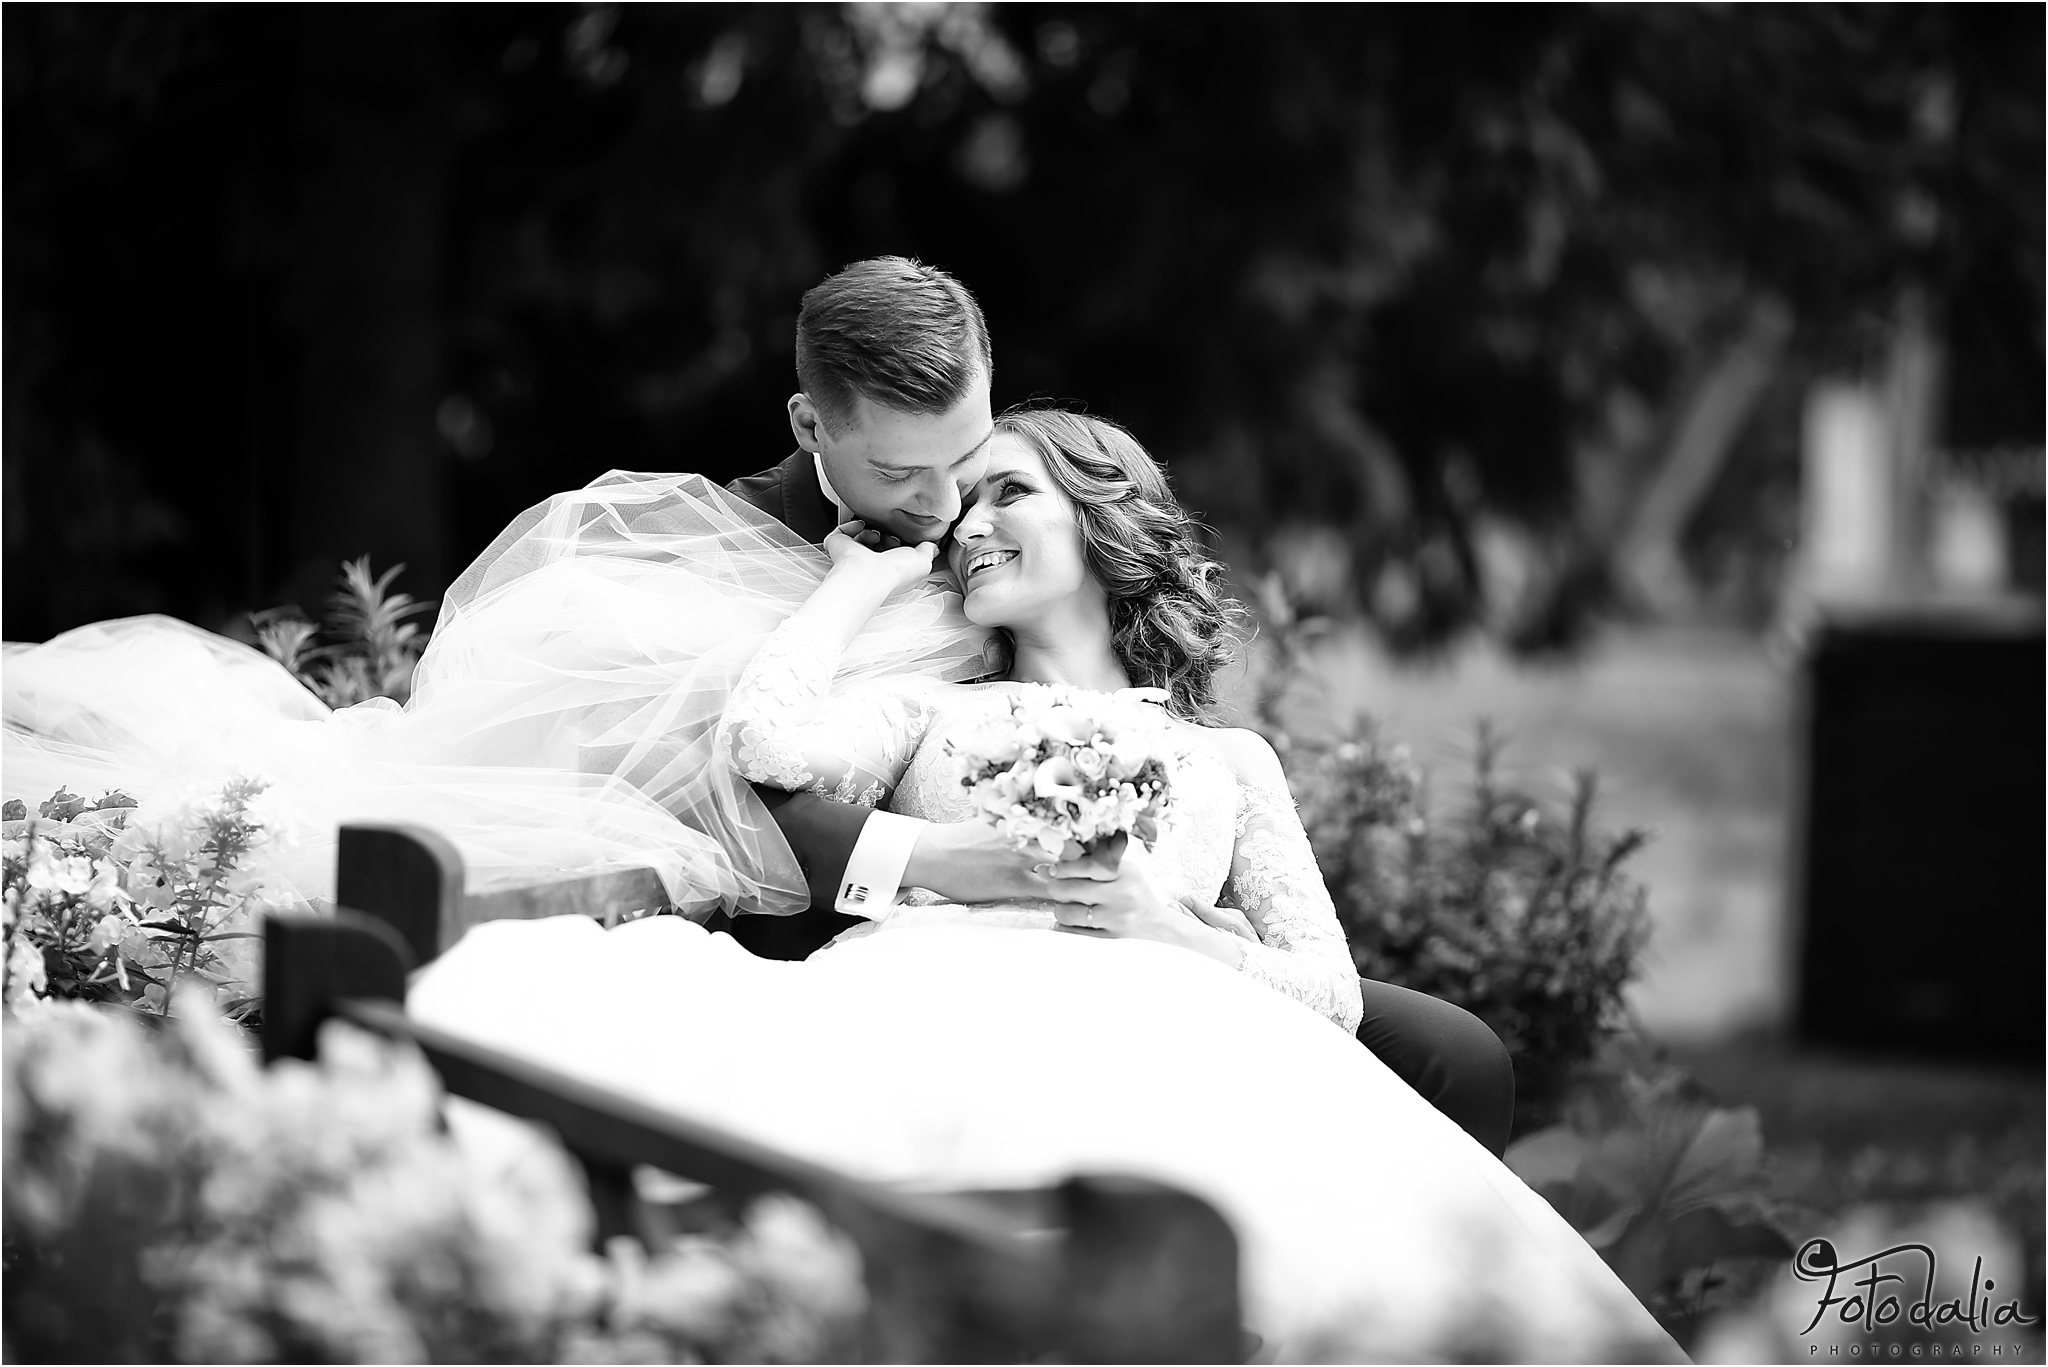 Ljubav i romantika u slici  Vestuviu_fotografai_fotodalia_myday_2